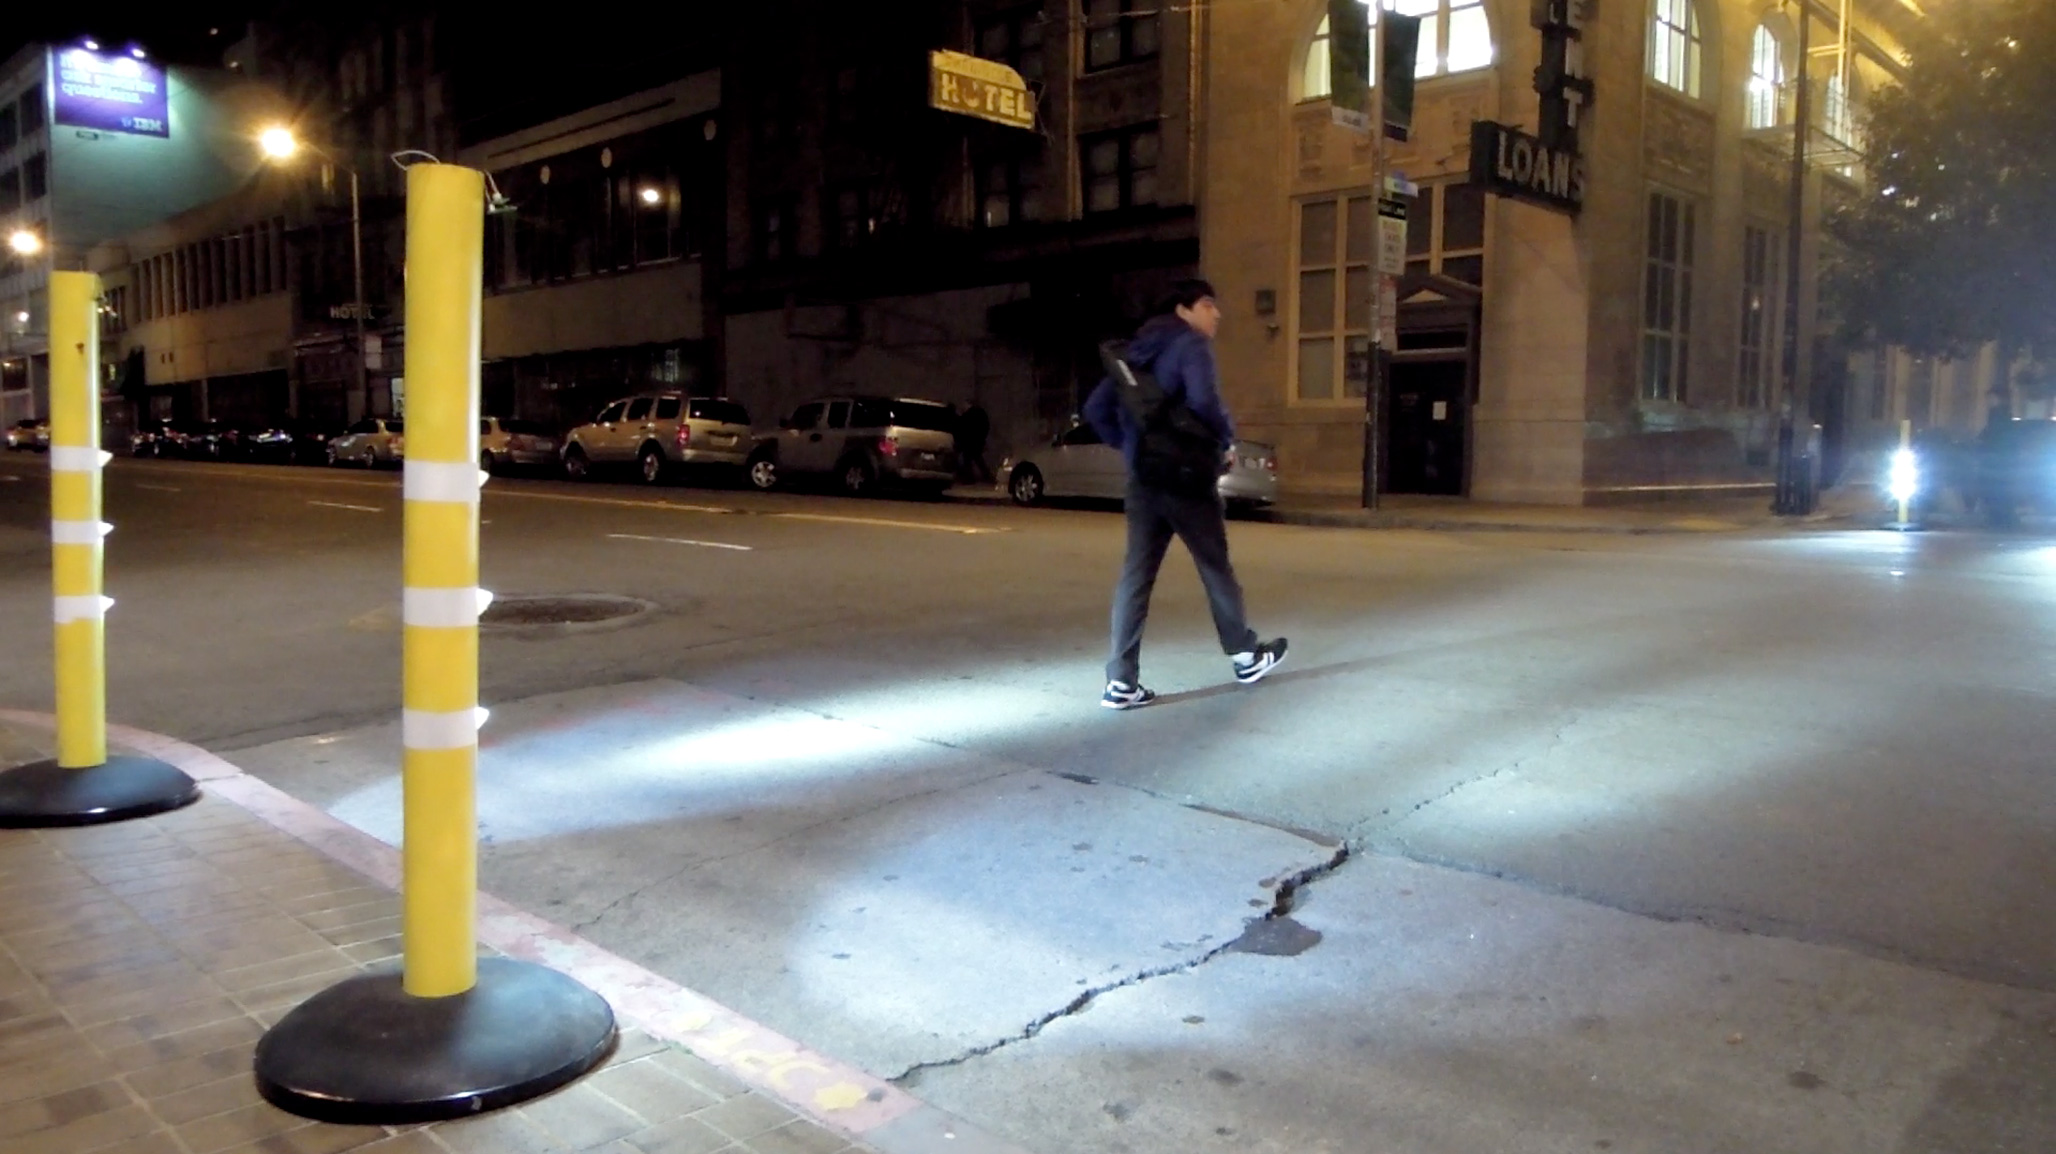 How to Make a 'Glowing Crosswalk' Urban Prototype